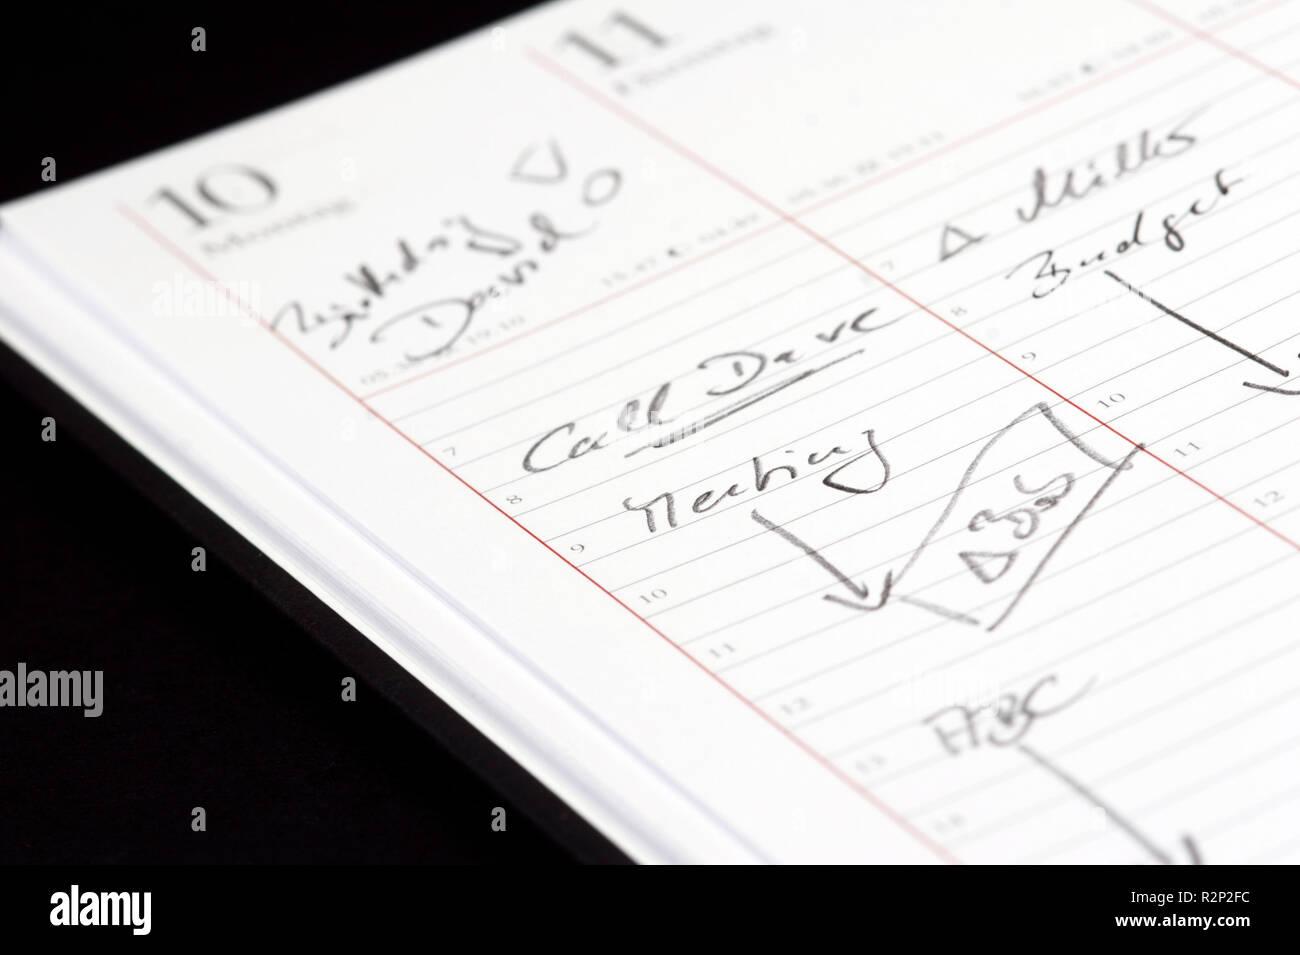 calendrier de bureau Banque D'Images